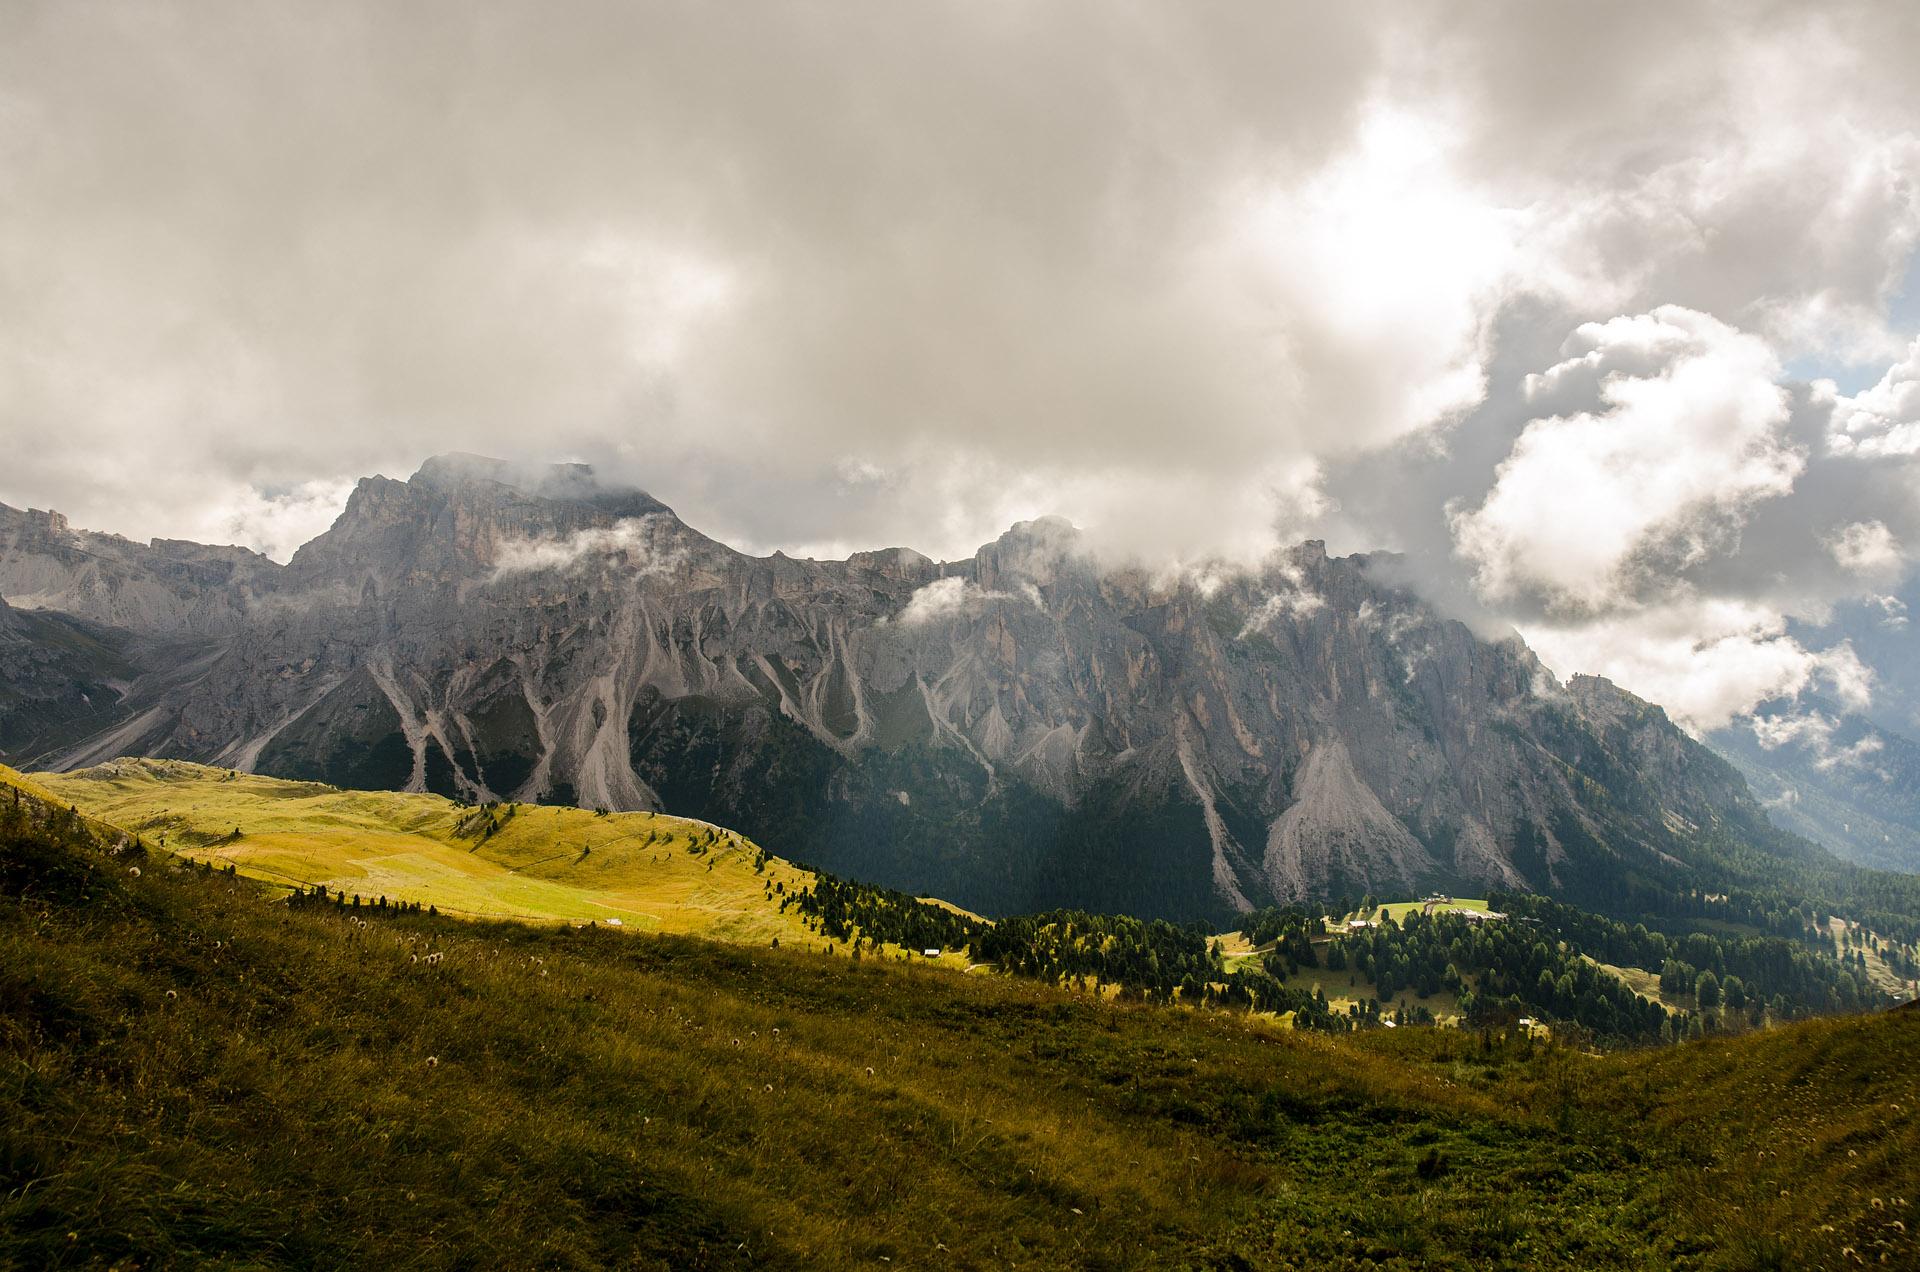 Alpe di Cisles (Cisles Alm)